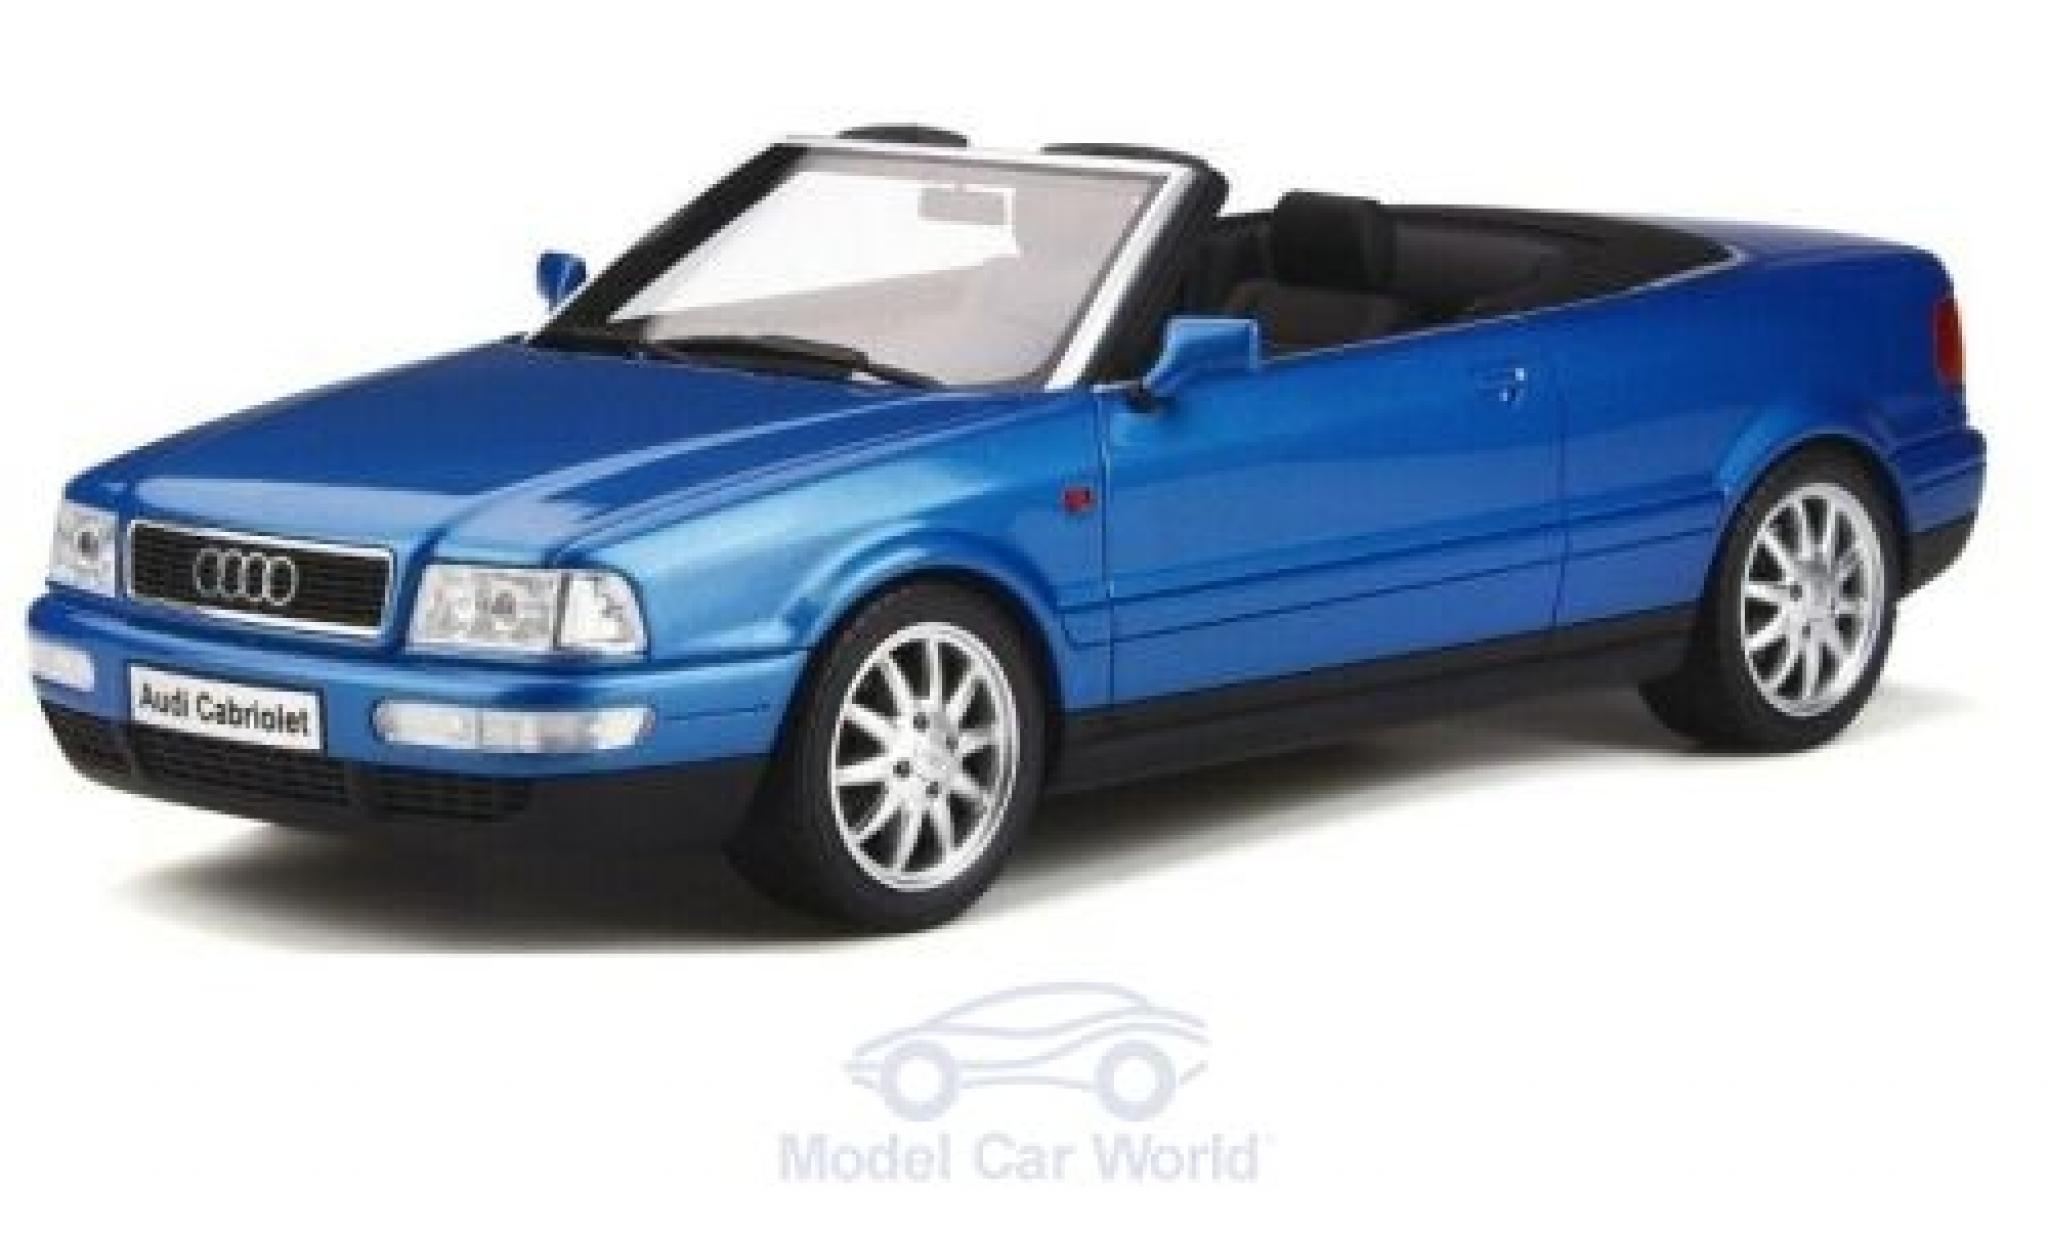 Audi 80 1/18 Ottomobile Cabriolet metallise bleue